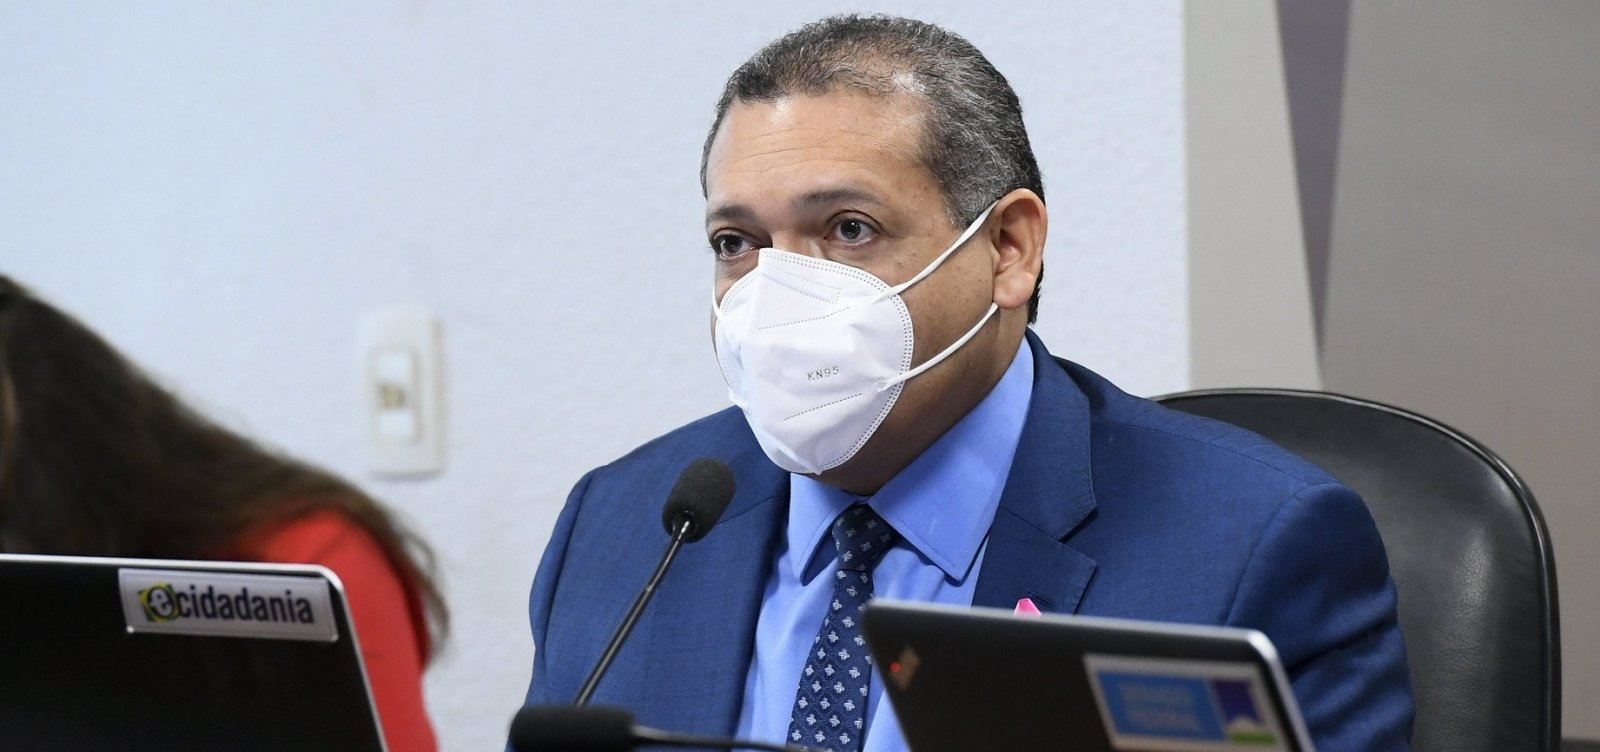 [Kassio Marques toma posse como ministro do STF nesta quinta-feira]